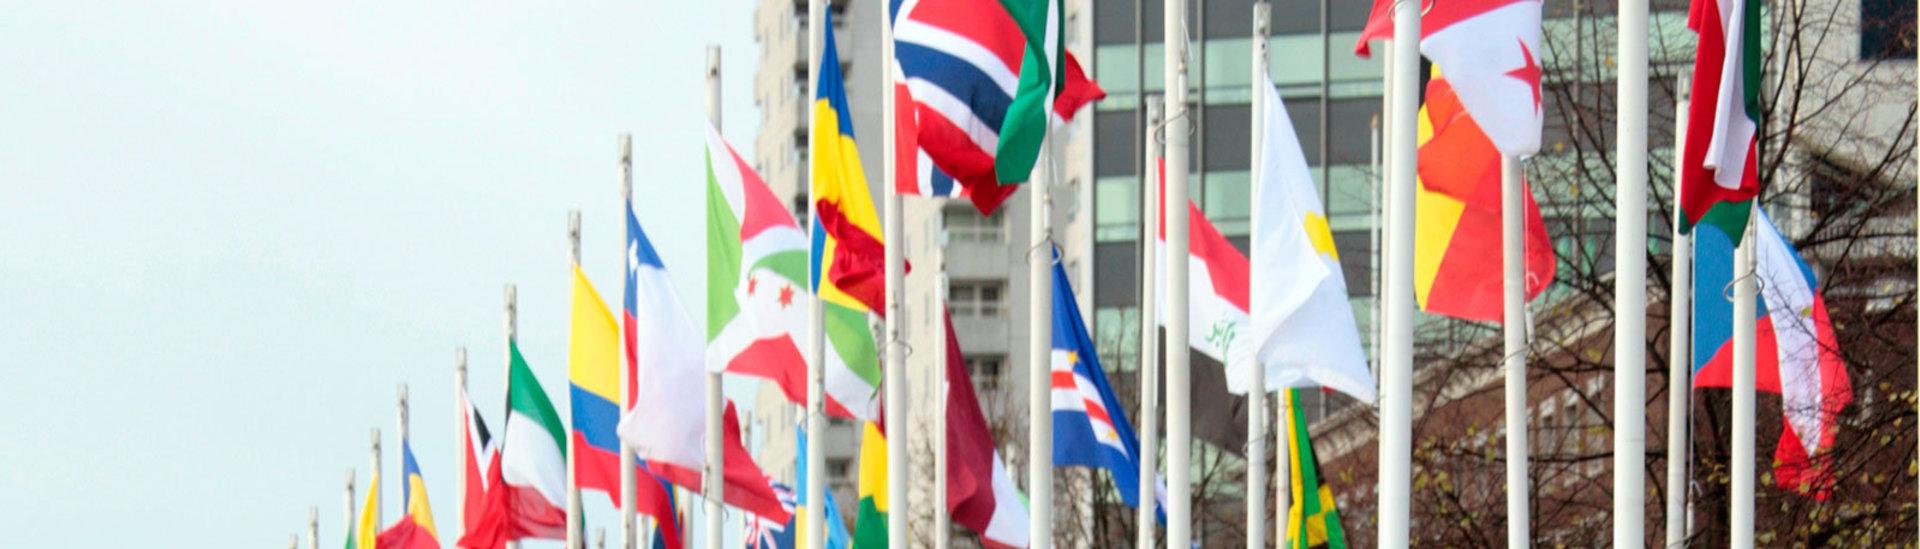 Europese vlaggen.